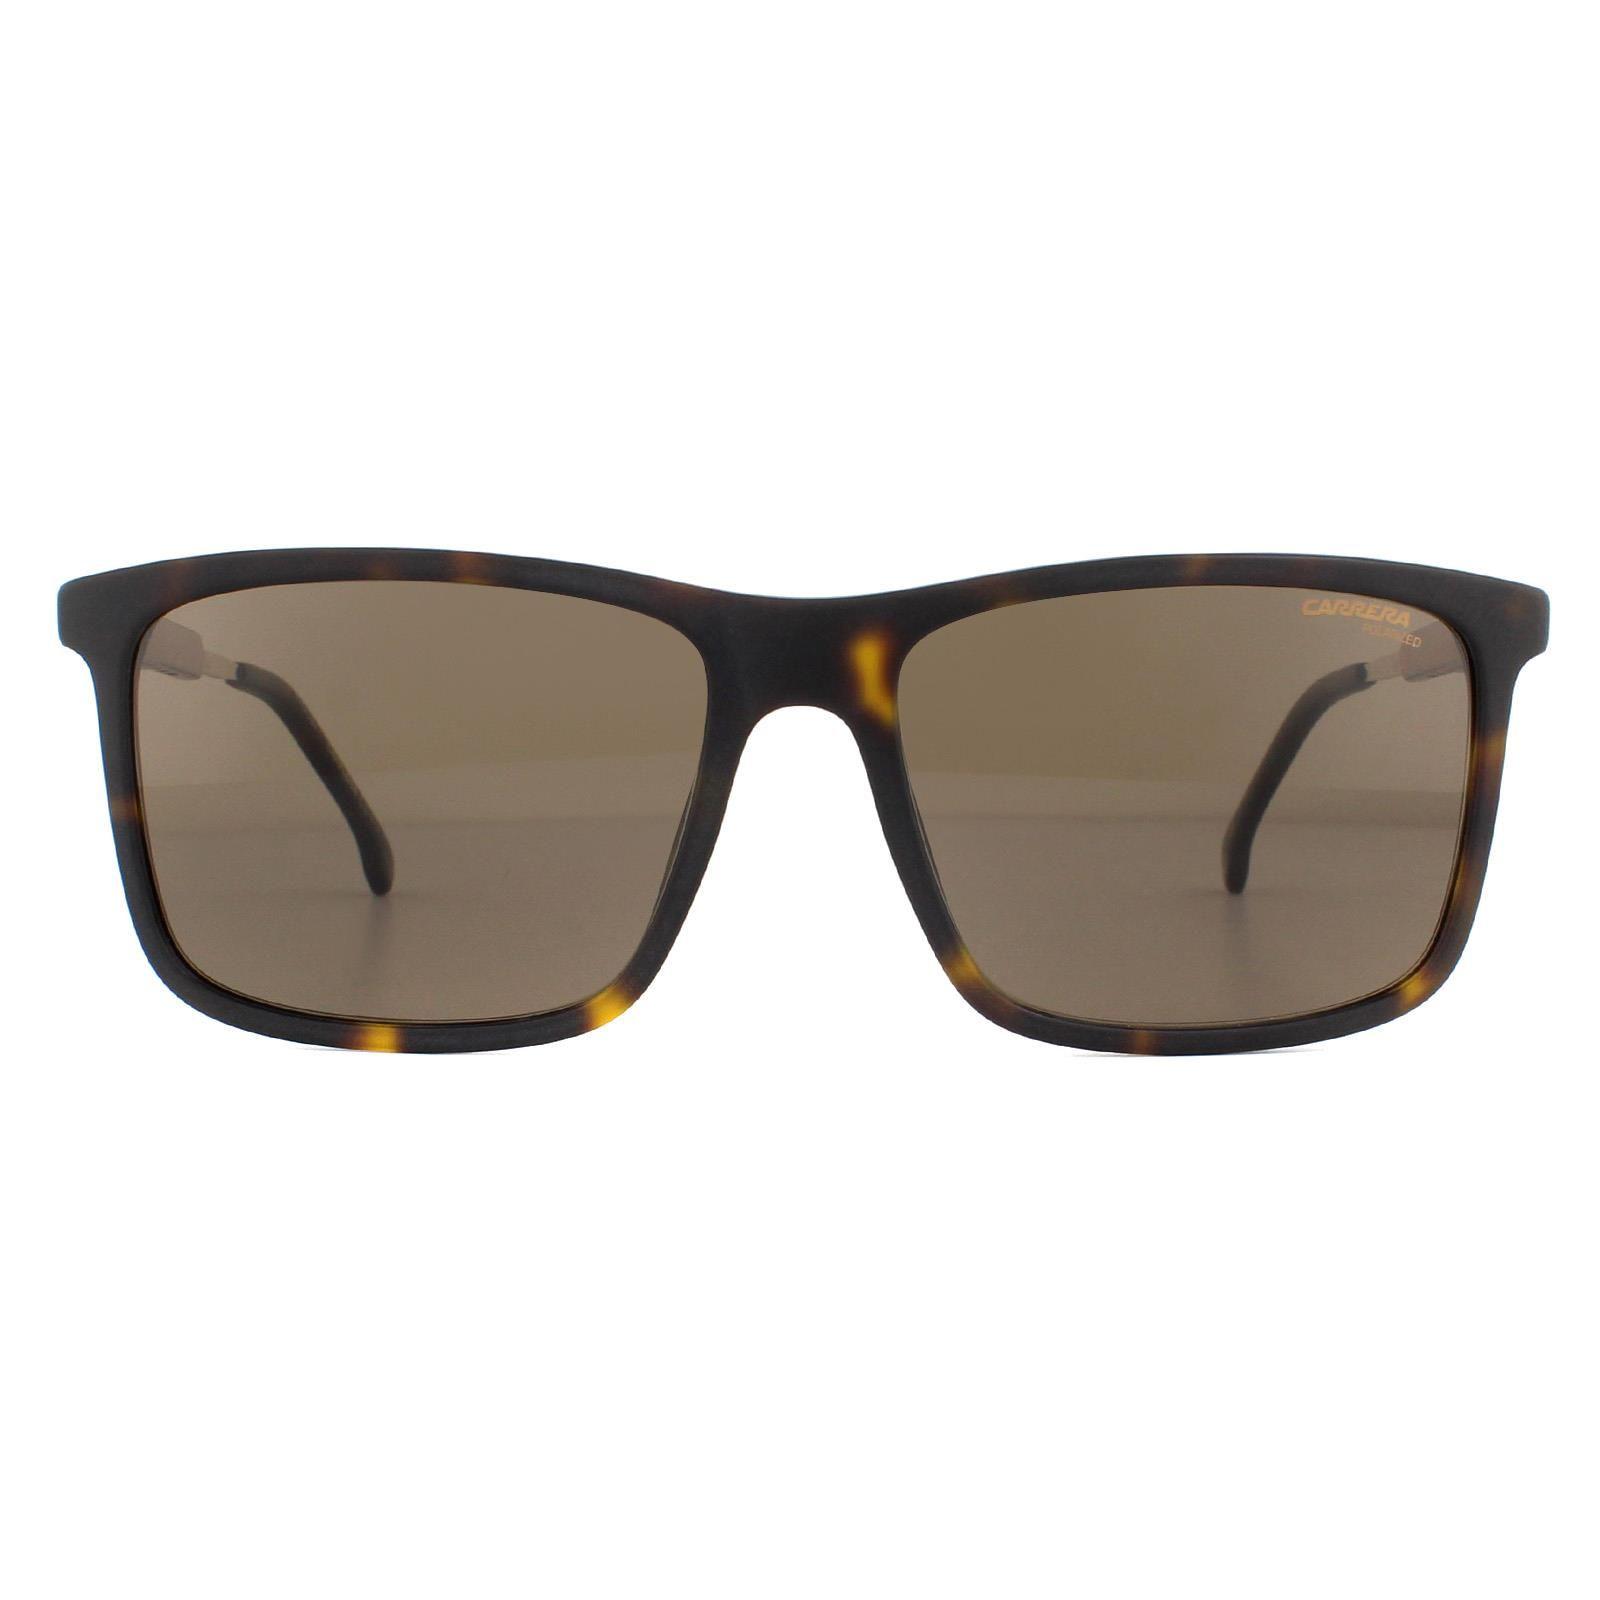 Carrera Sunglasses 8029/S 086 SP Dark Havana Bronze Polarized